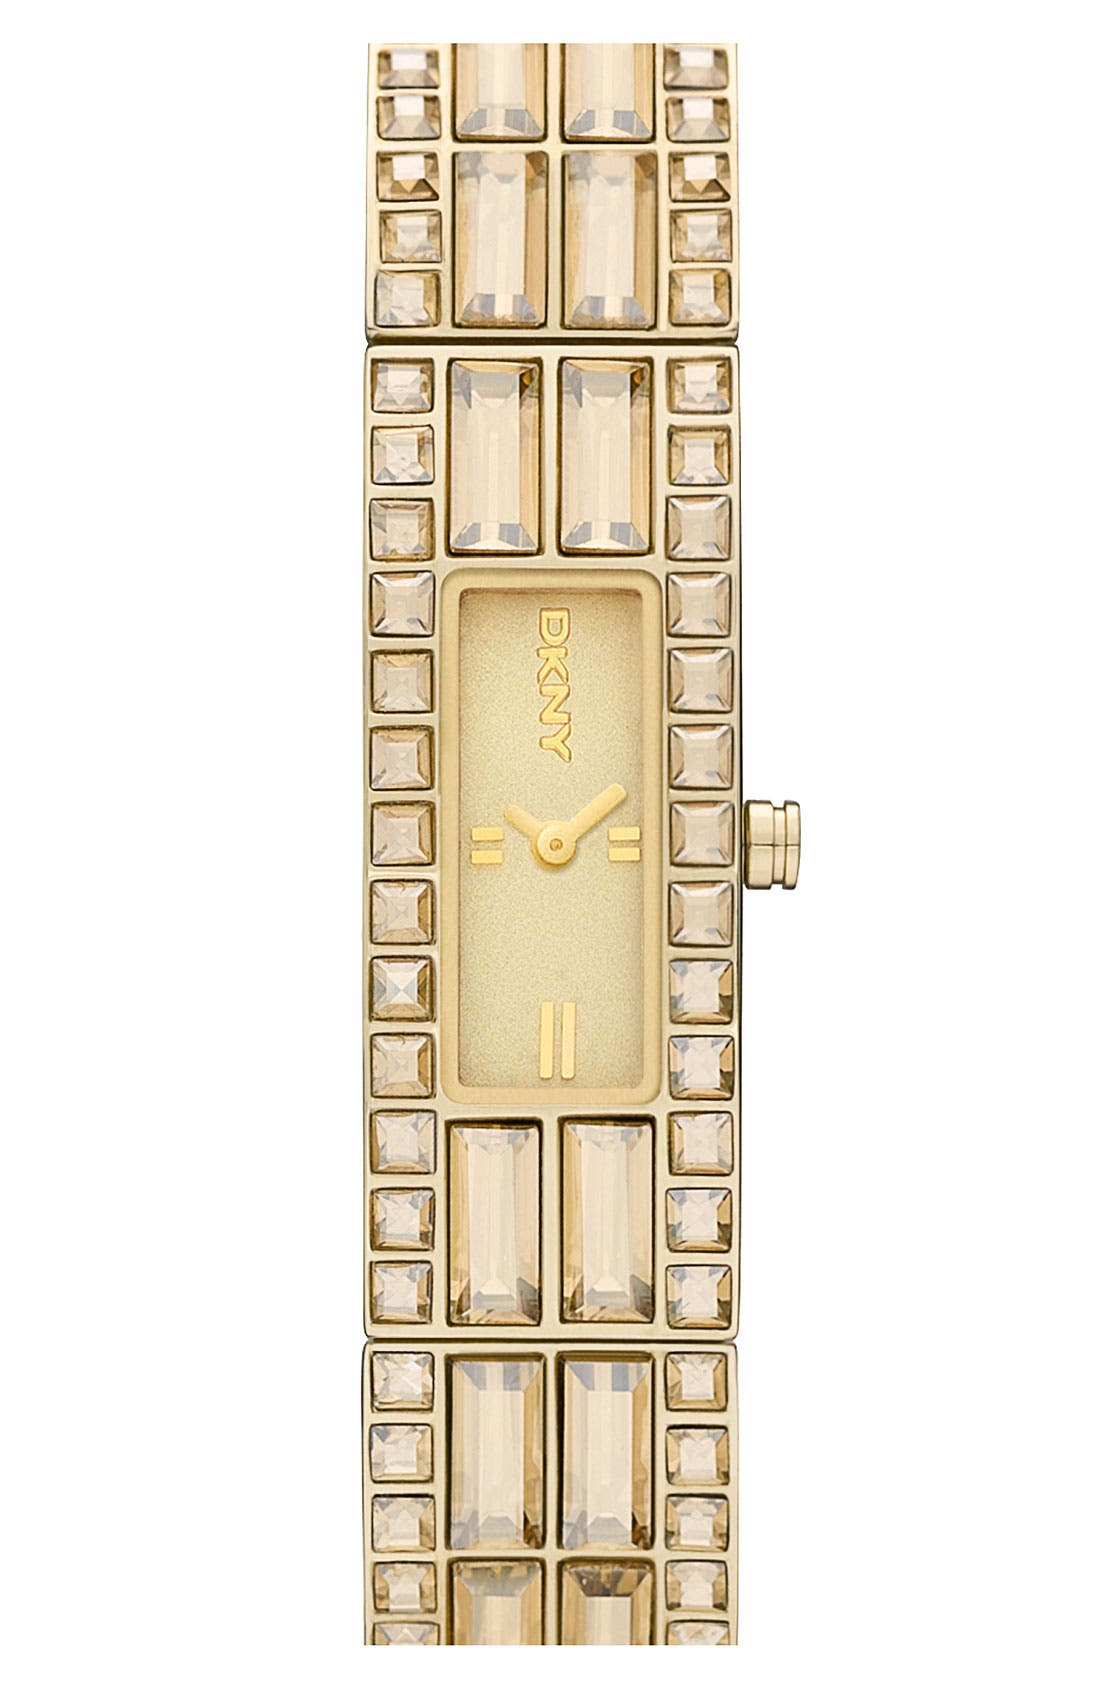 Alternate Image 1 Selected - DKNY 'Beekman' Slim Bangle Watch, 33mm